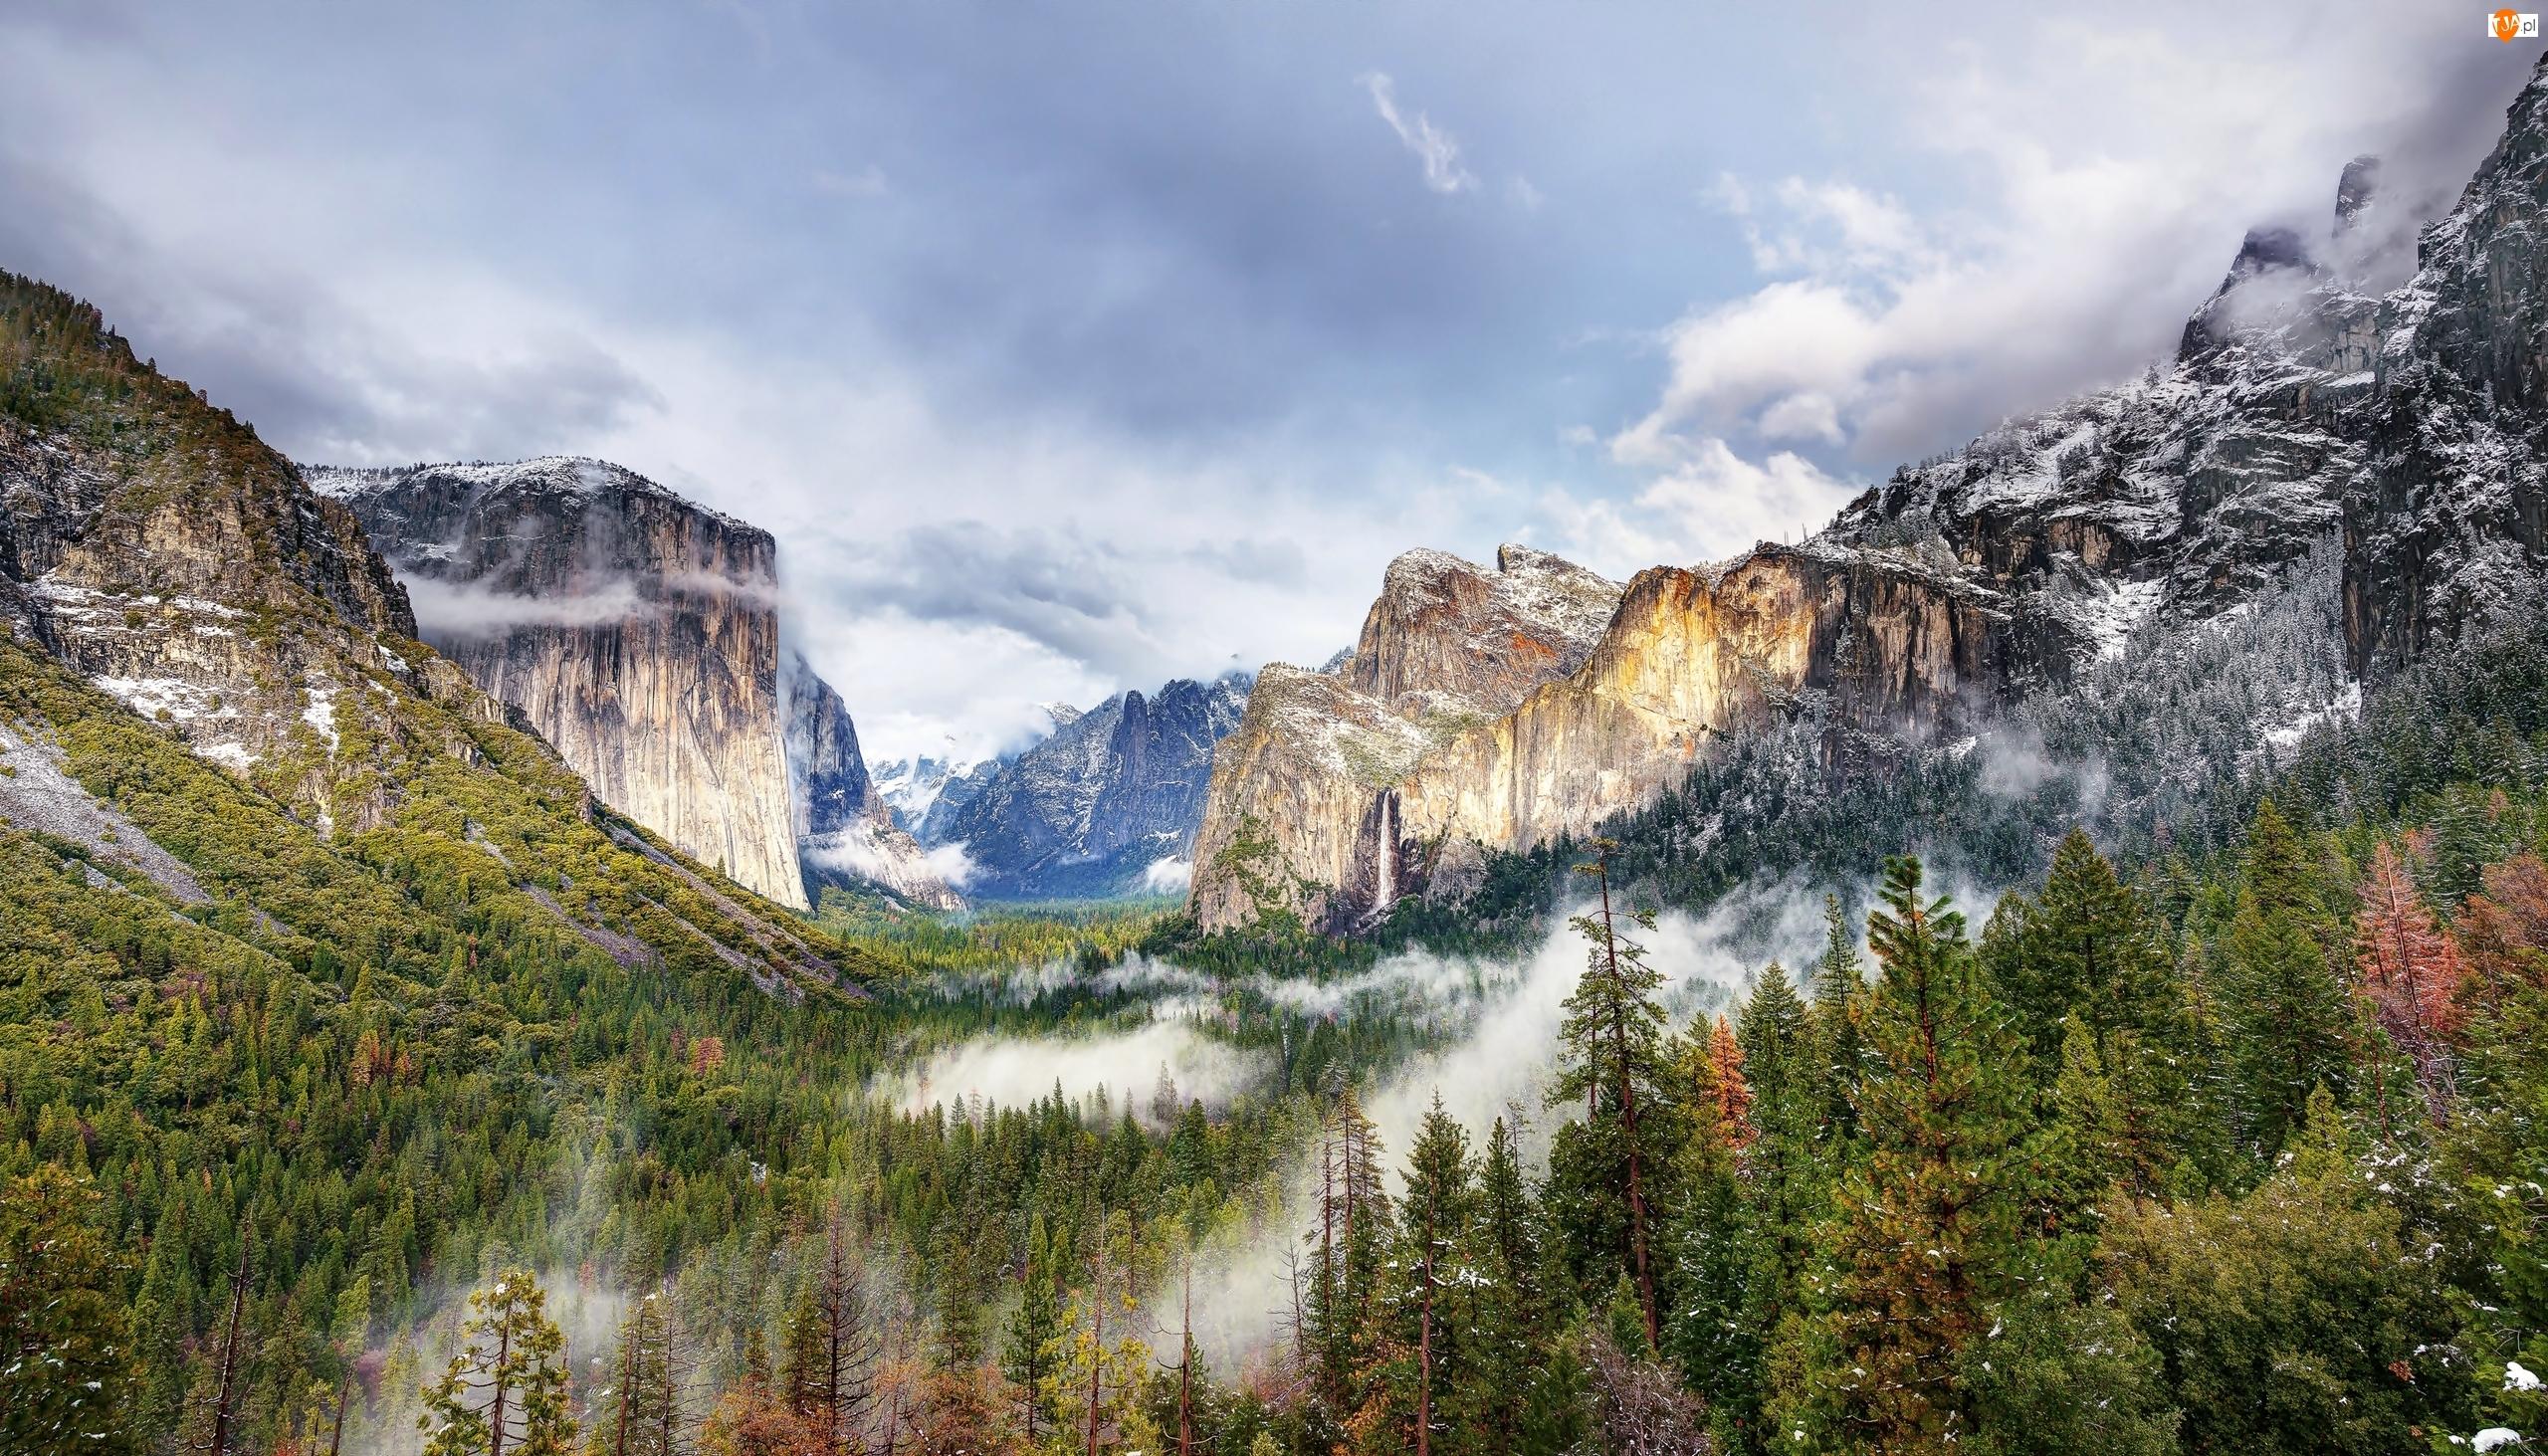 Las, Dolina Yosemite Valley, Kalifornia, Stany Zjednoczone, Mgła, Park Narodowy Yosemite, Góry